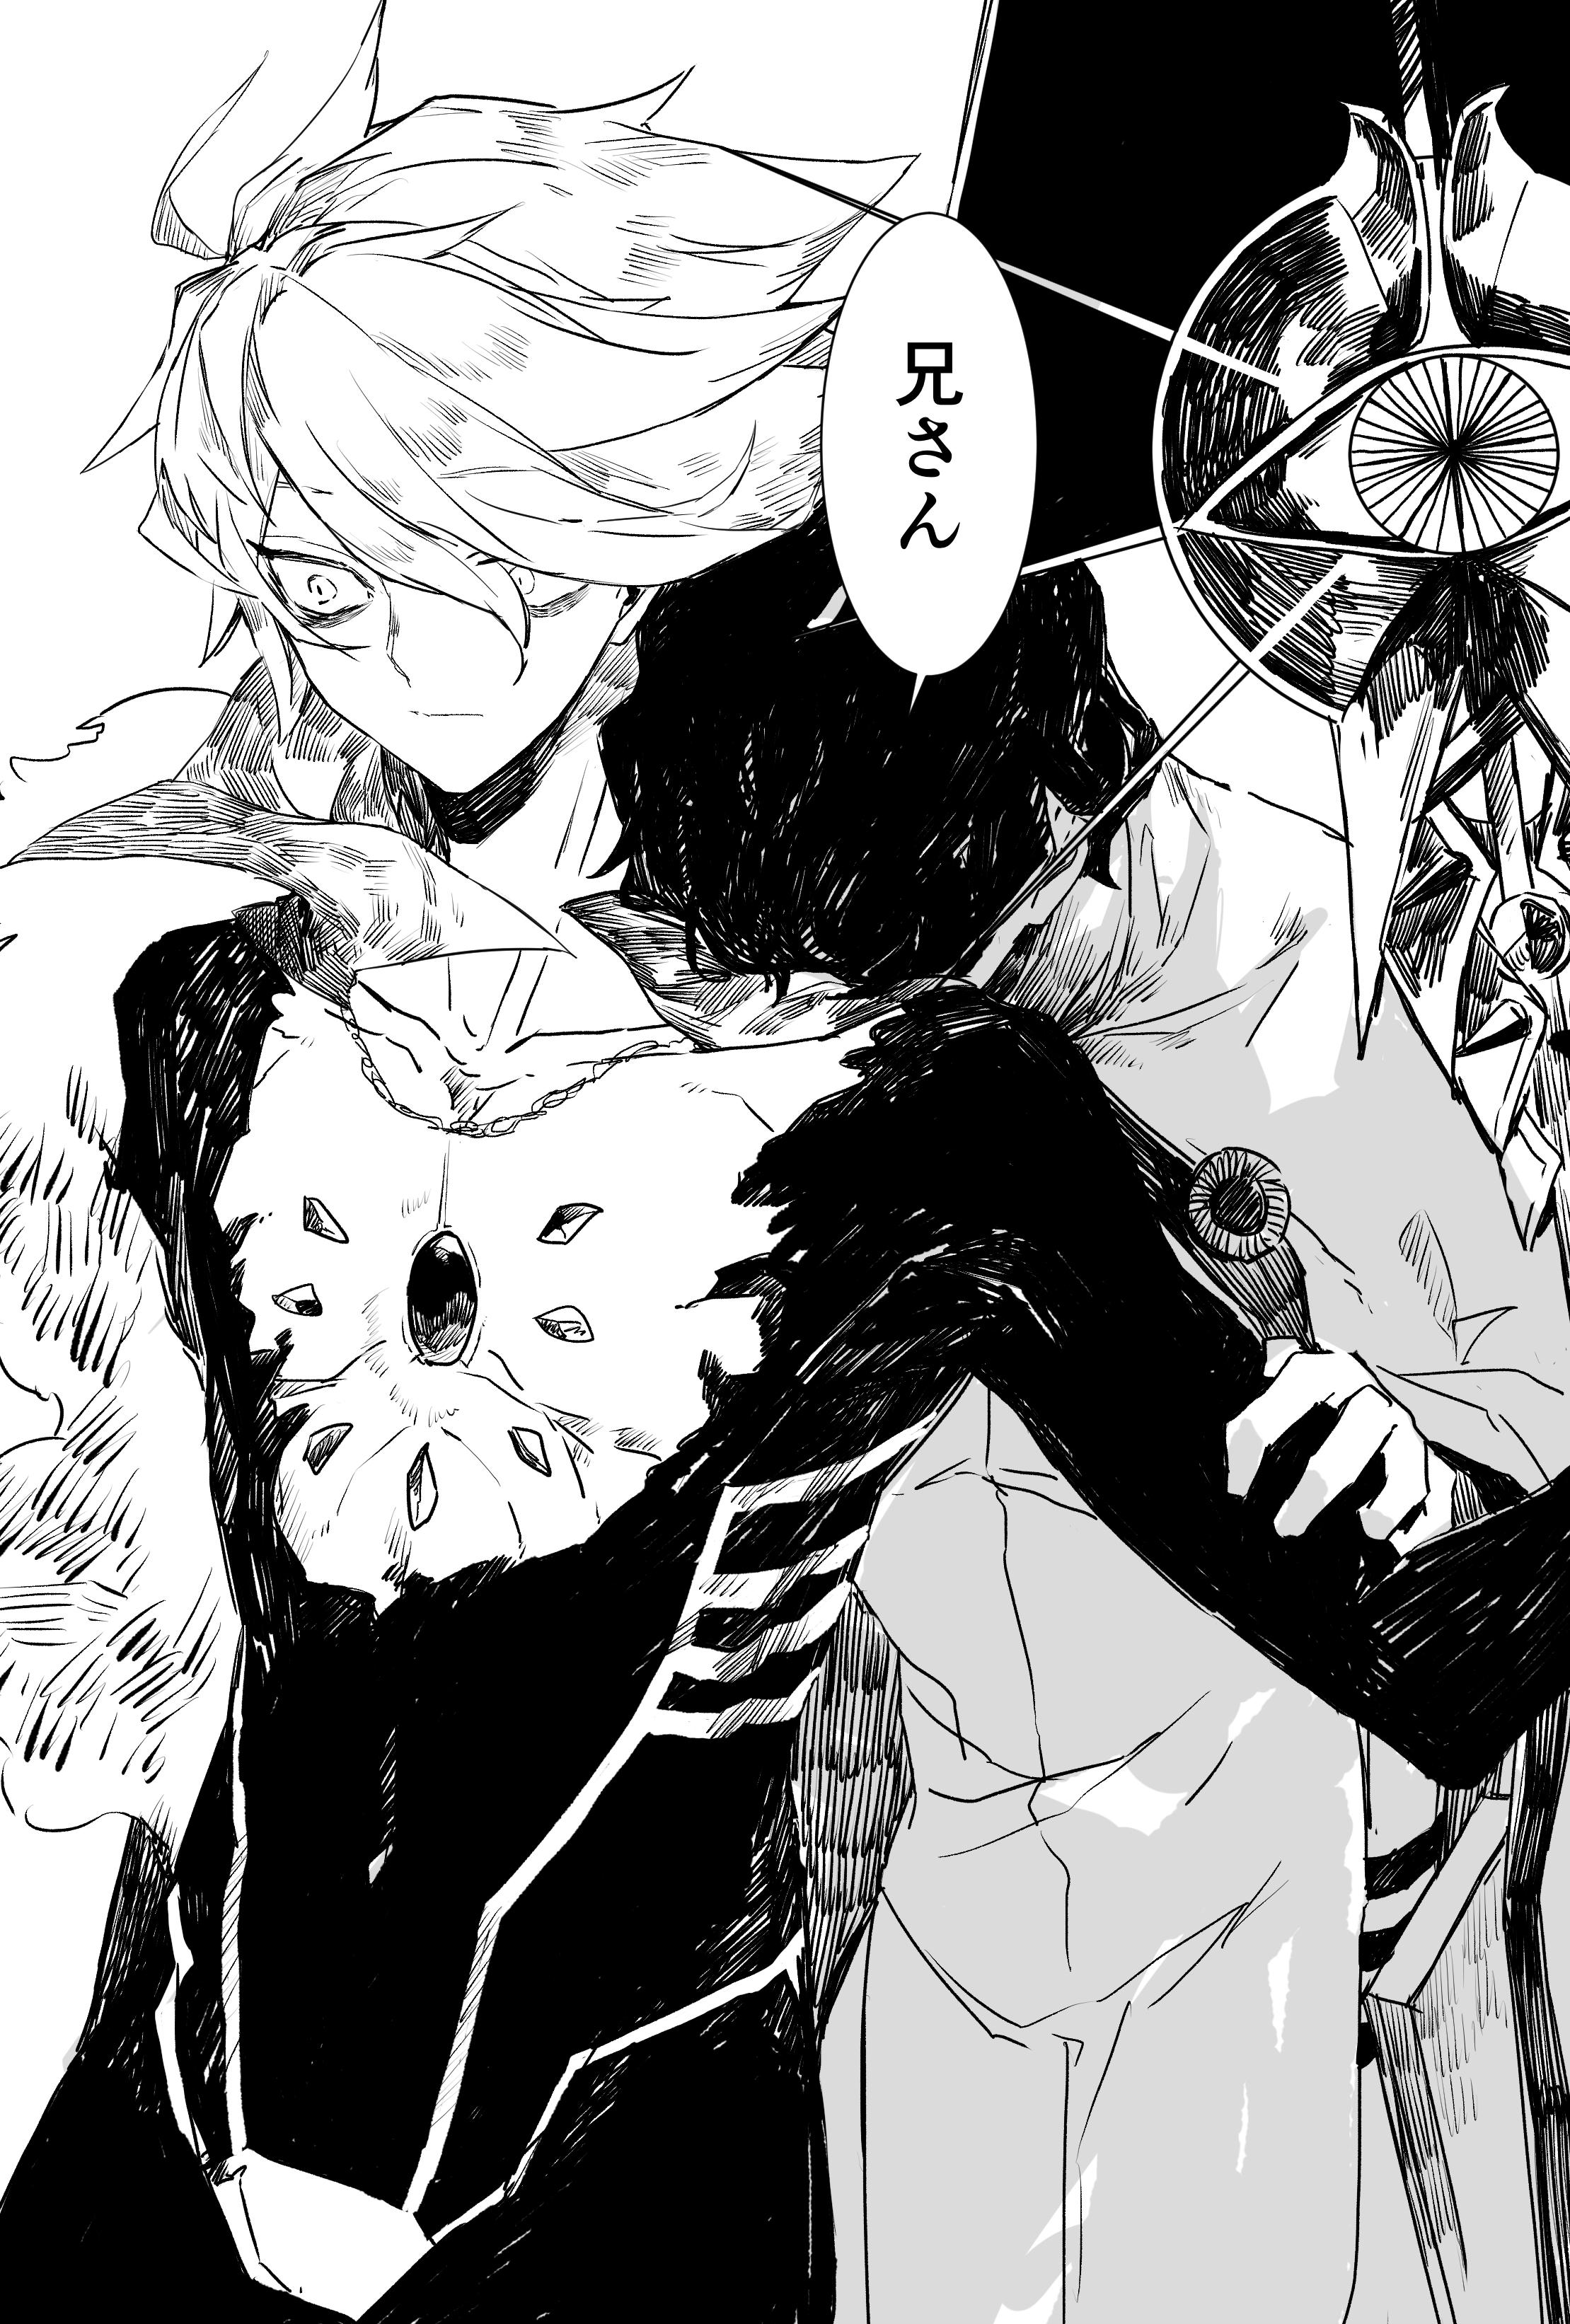 Fate/Grand Order Image #2685076 - Zerochan Anime Image Board